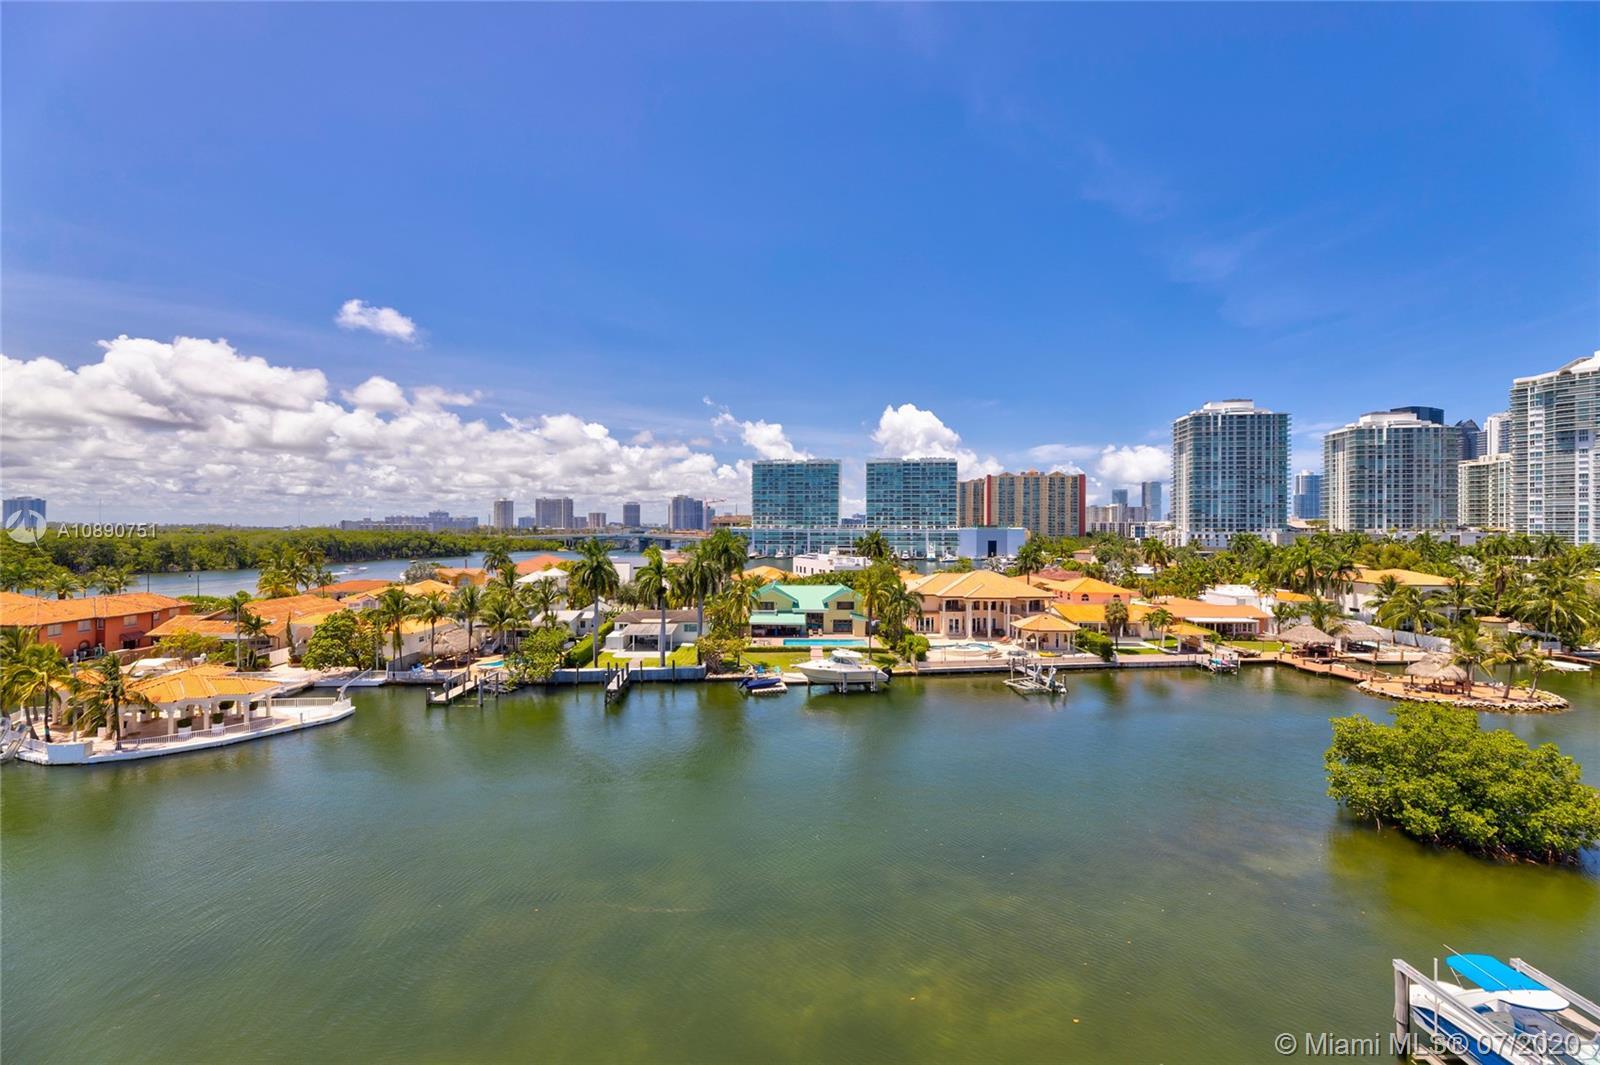 Photo of 425 Poinciana Island Drive #1444, Sunny Isles Beach, Florida, 33160 - Grand terrace with north east skyline views